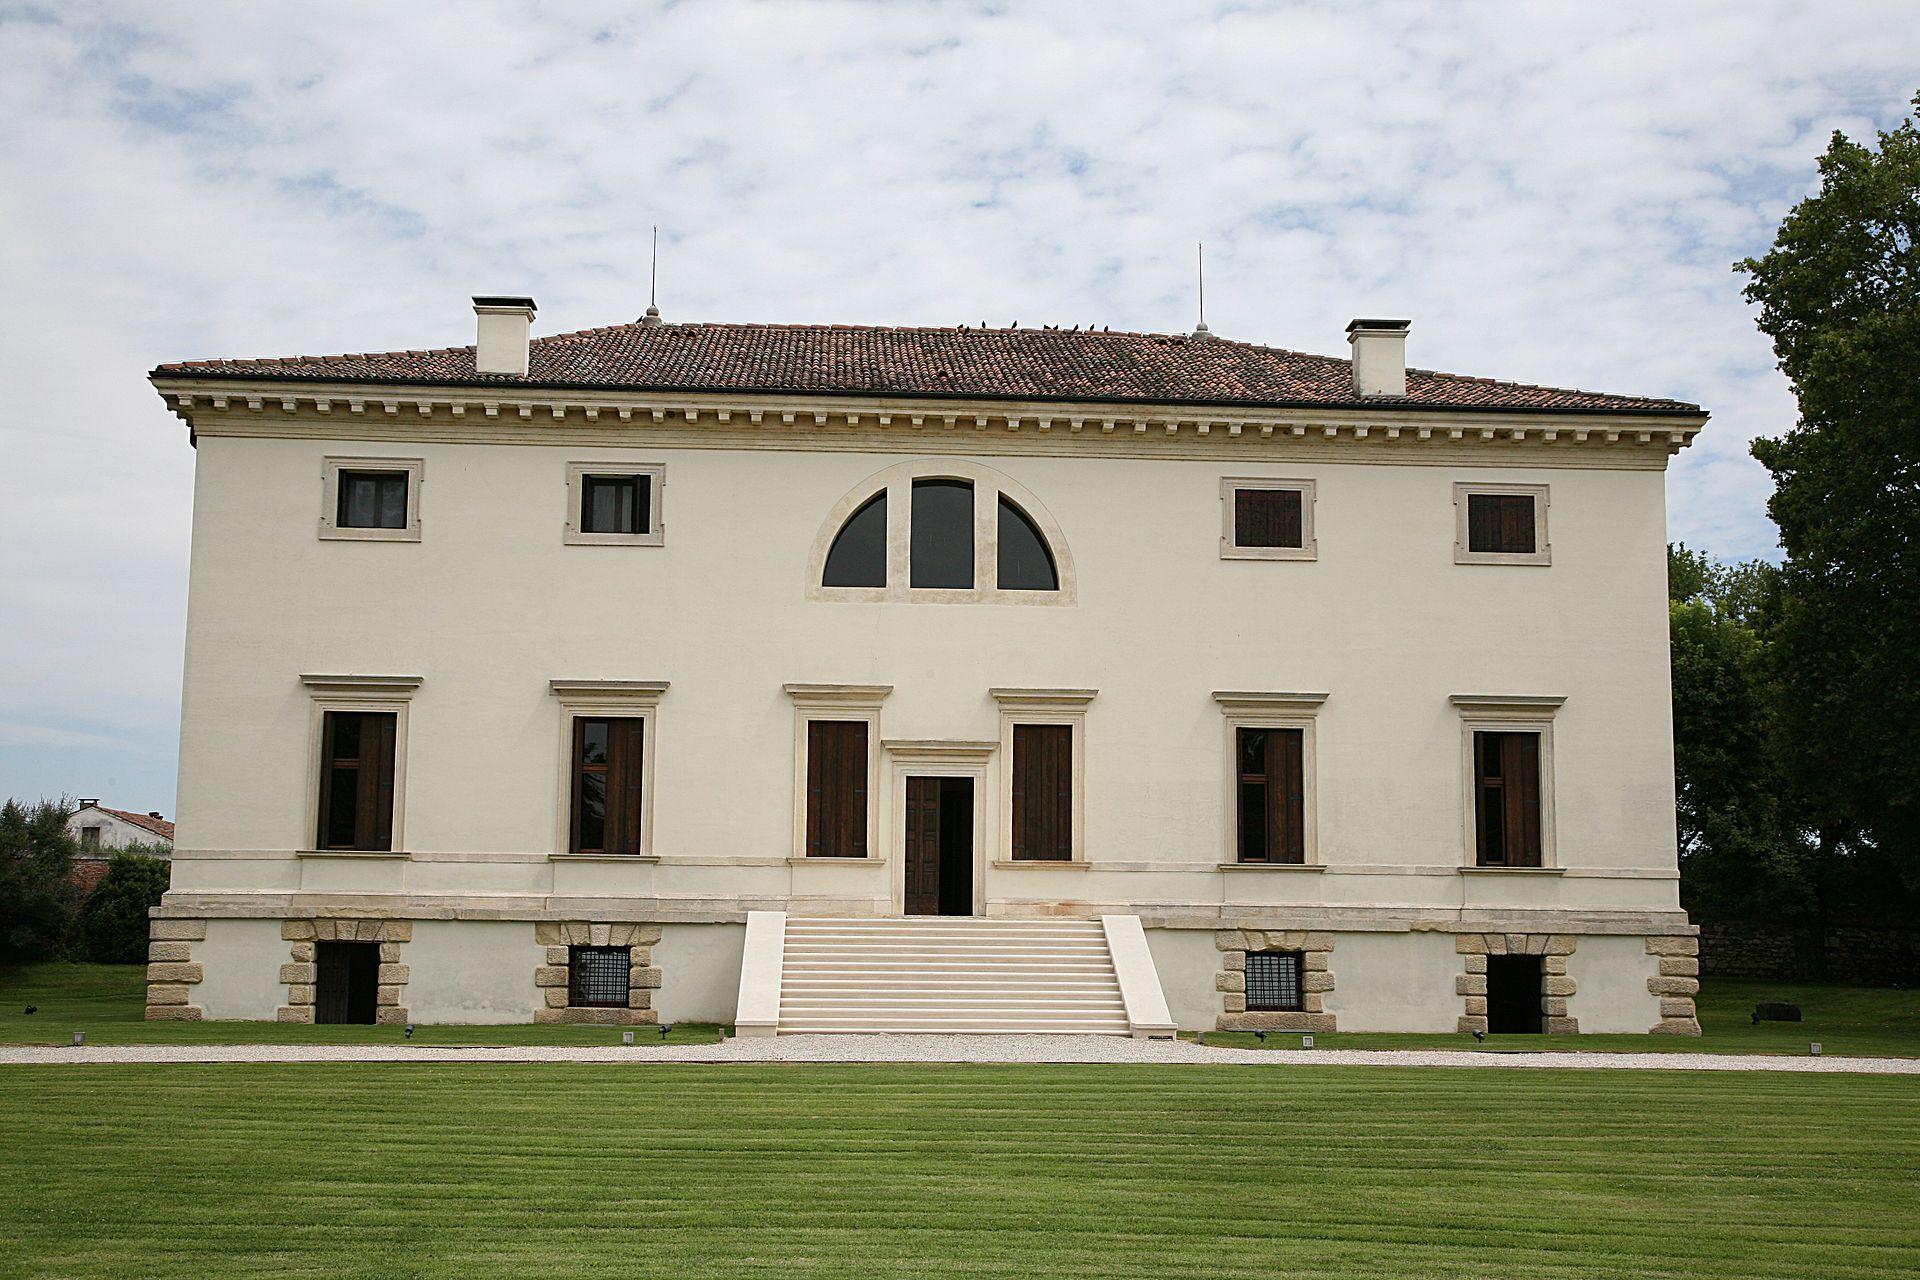 Villa Pisani Bagnolo Wikipedia The Free Encyclopedia Andrea